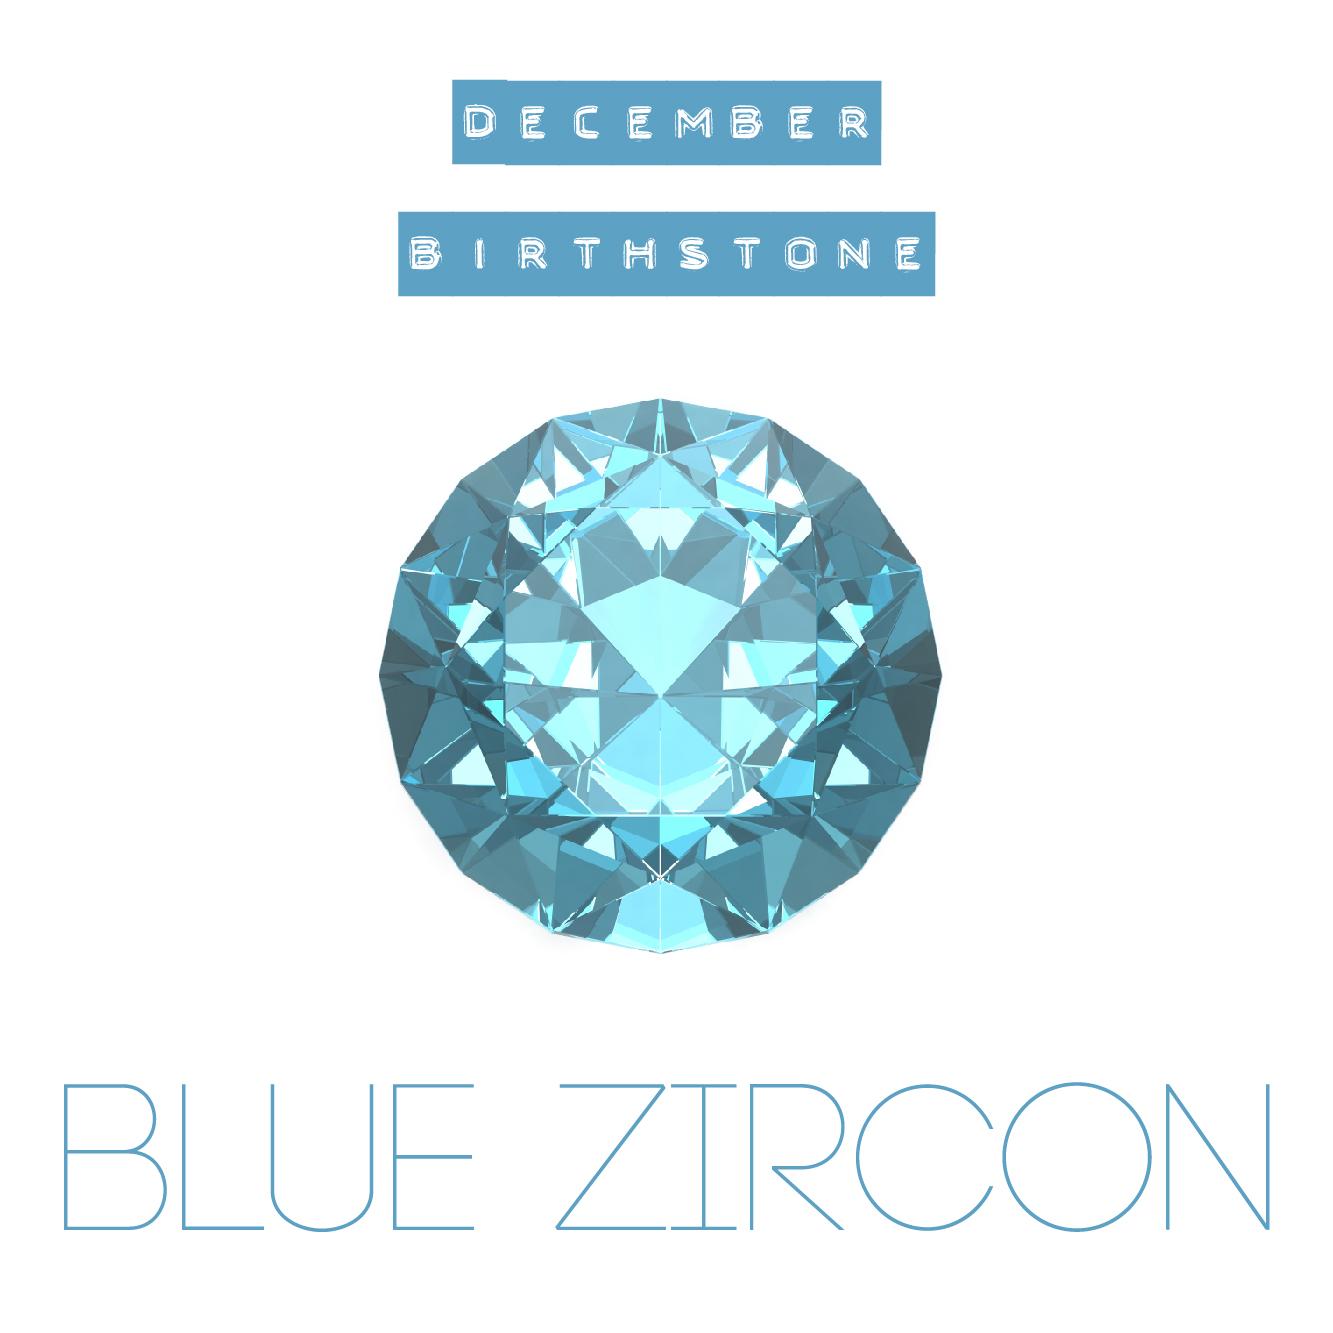 Blue_Zircon-01.jpg